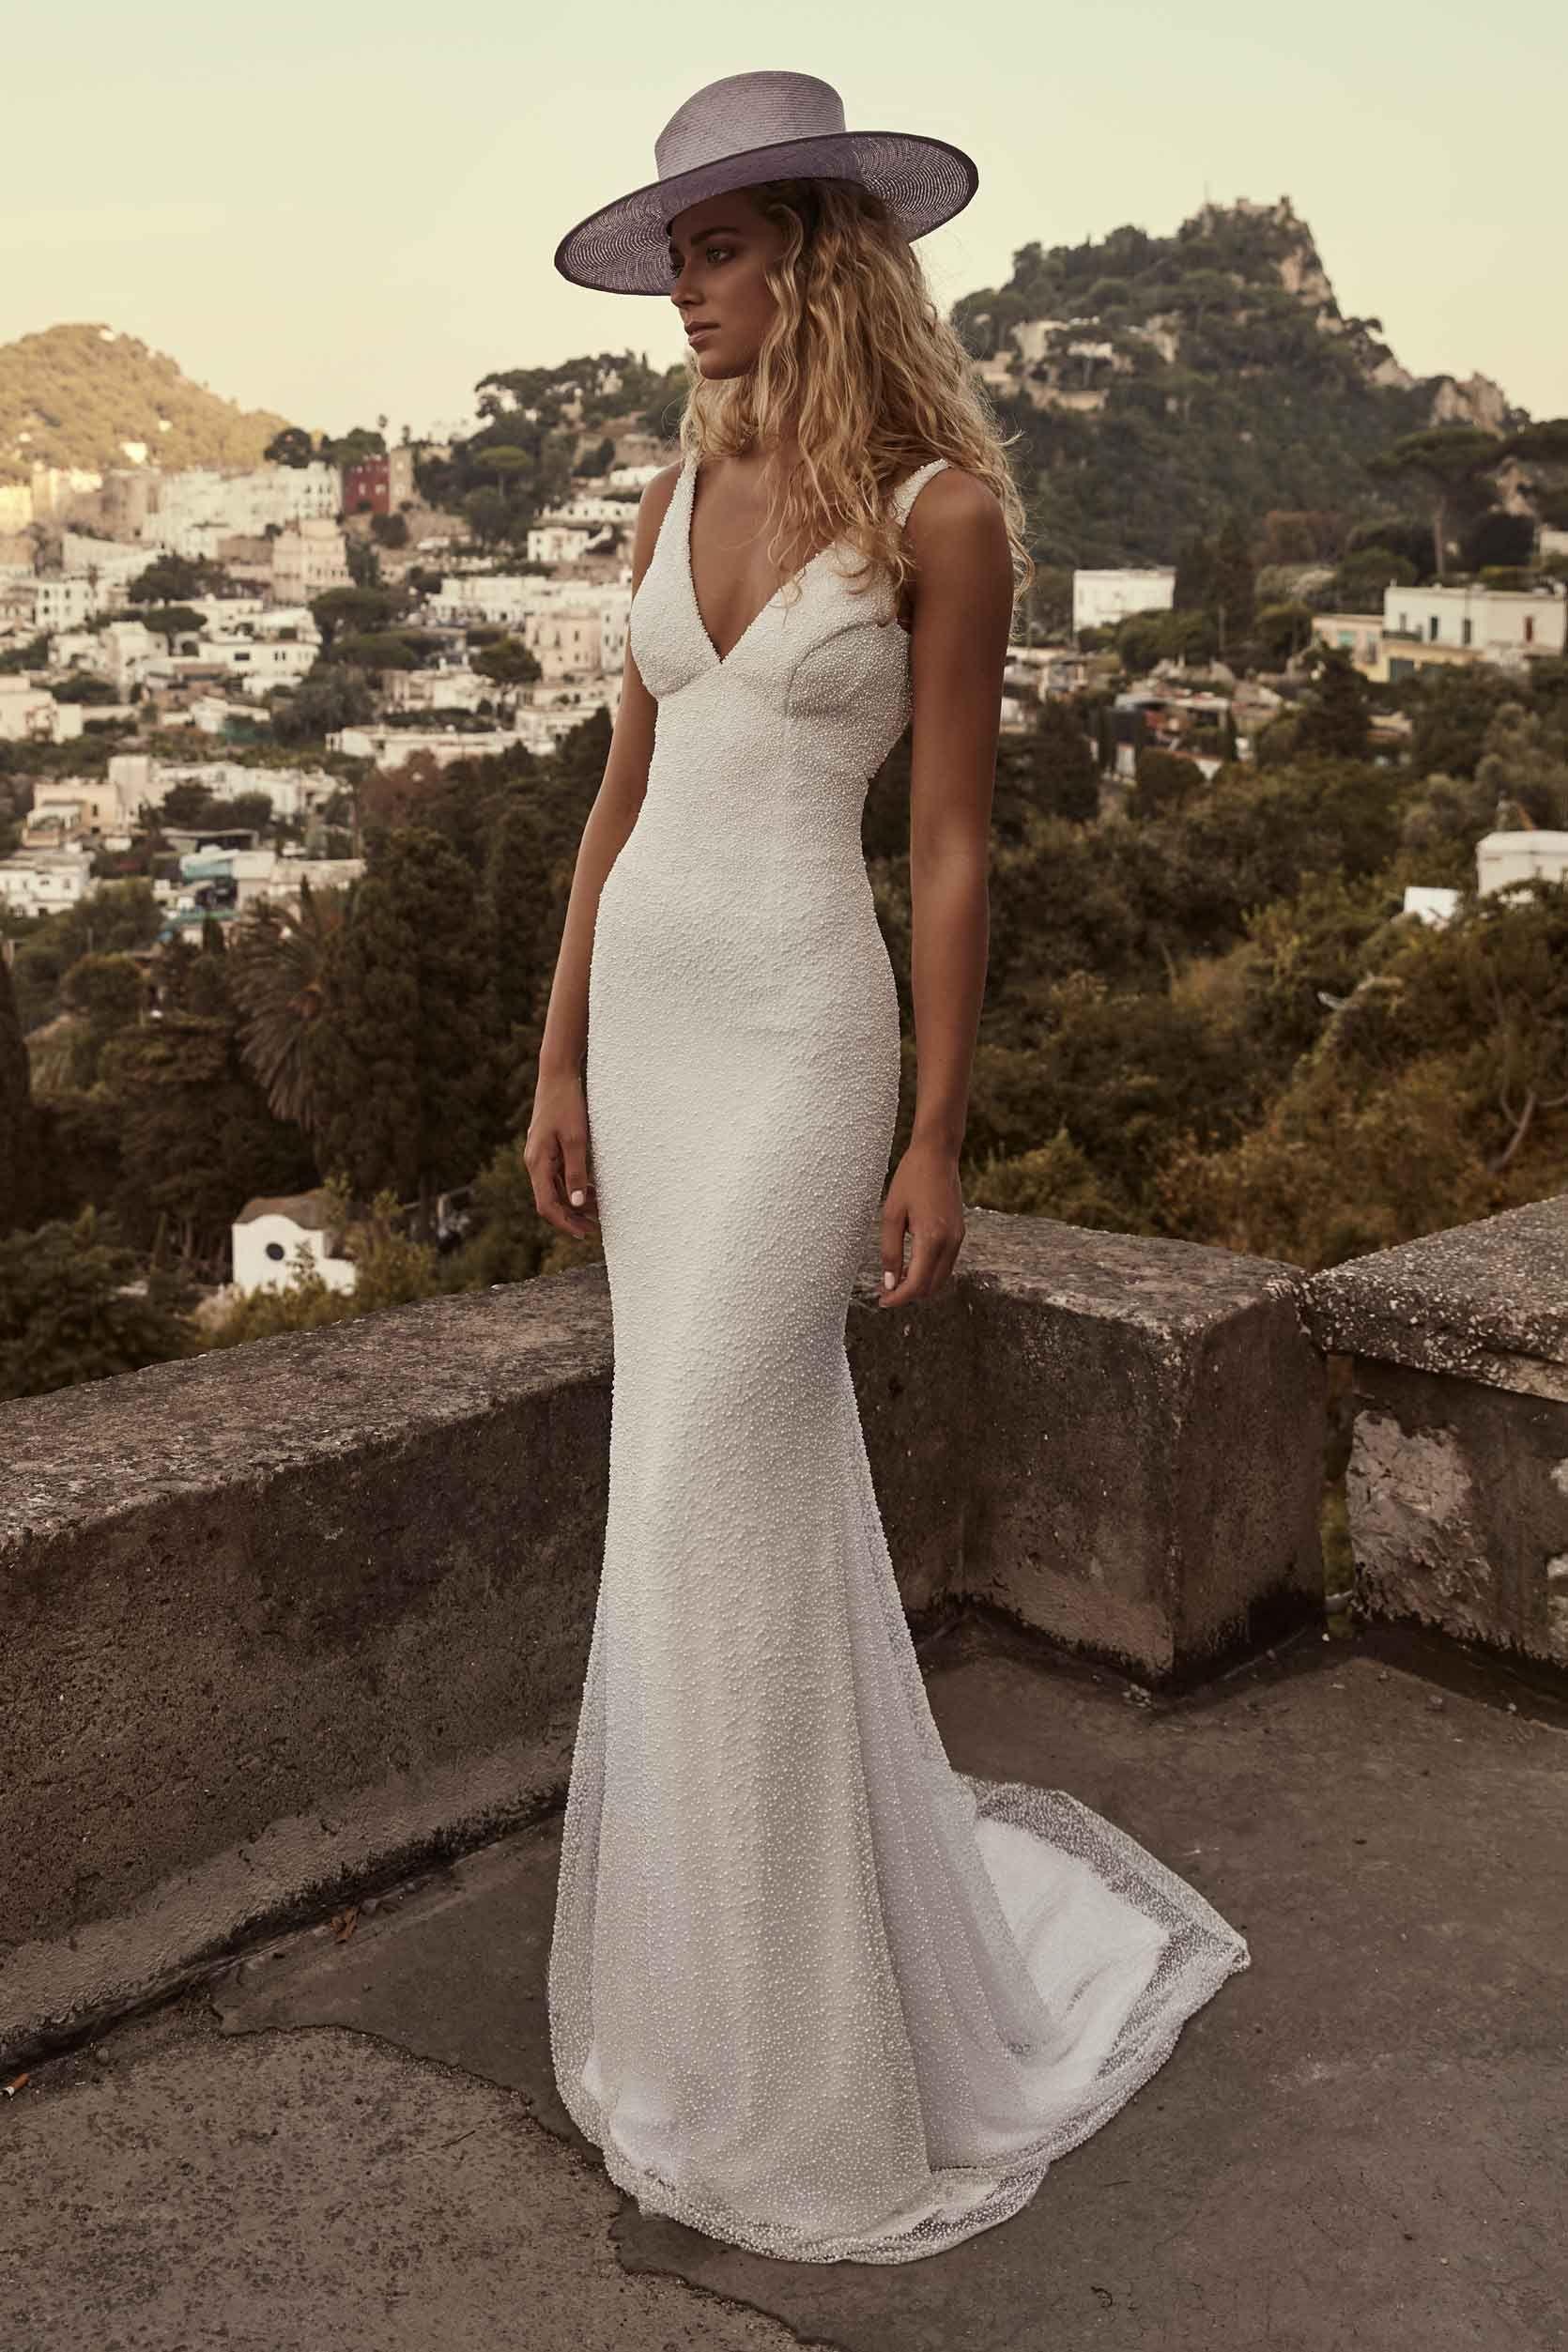 Natalie | One Day Bridal